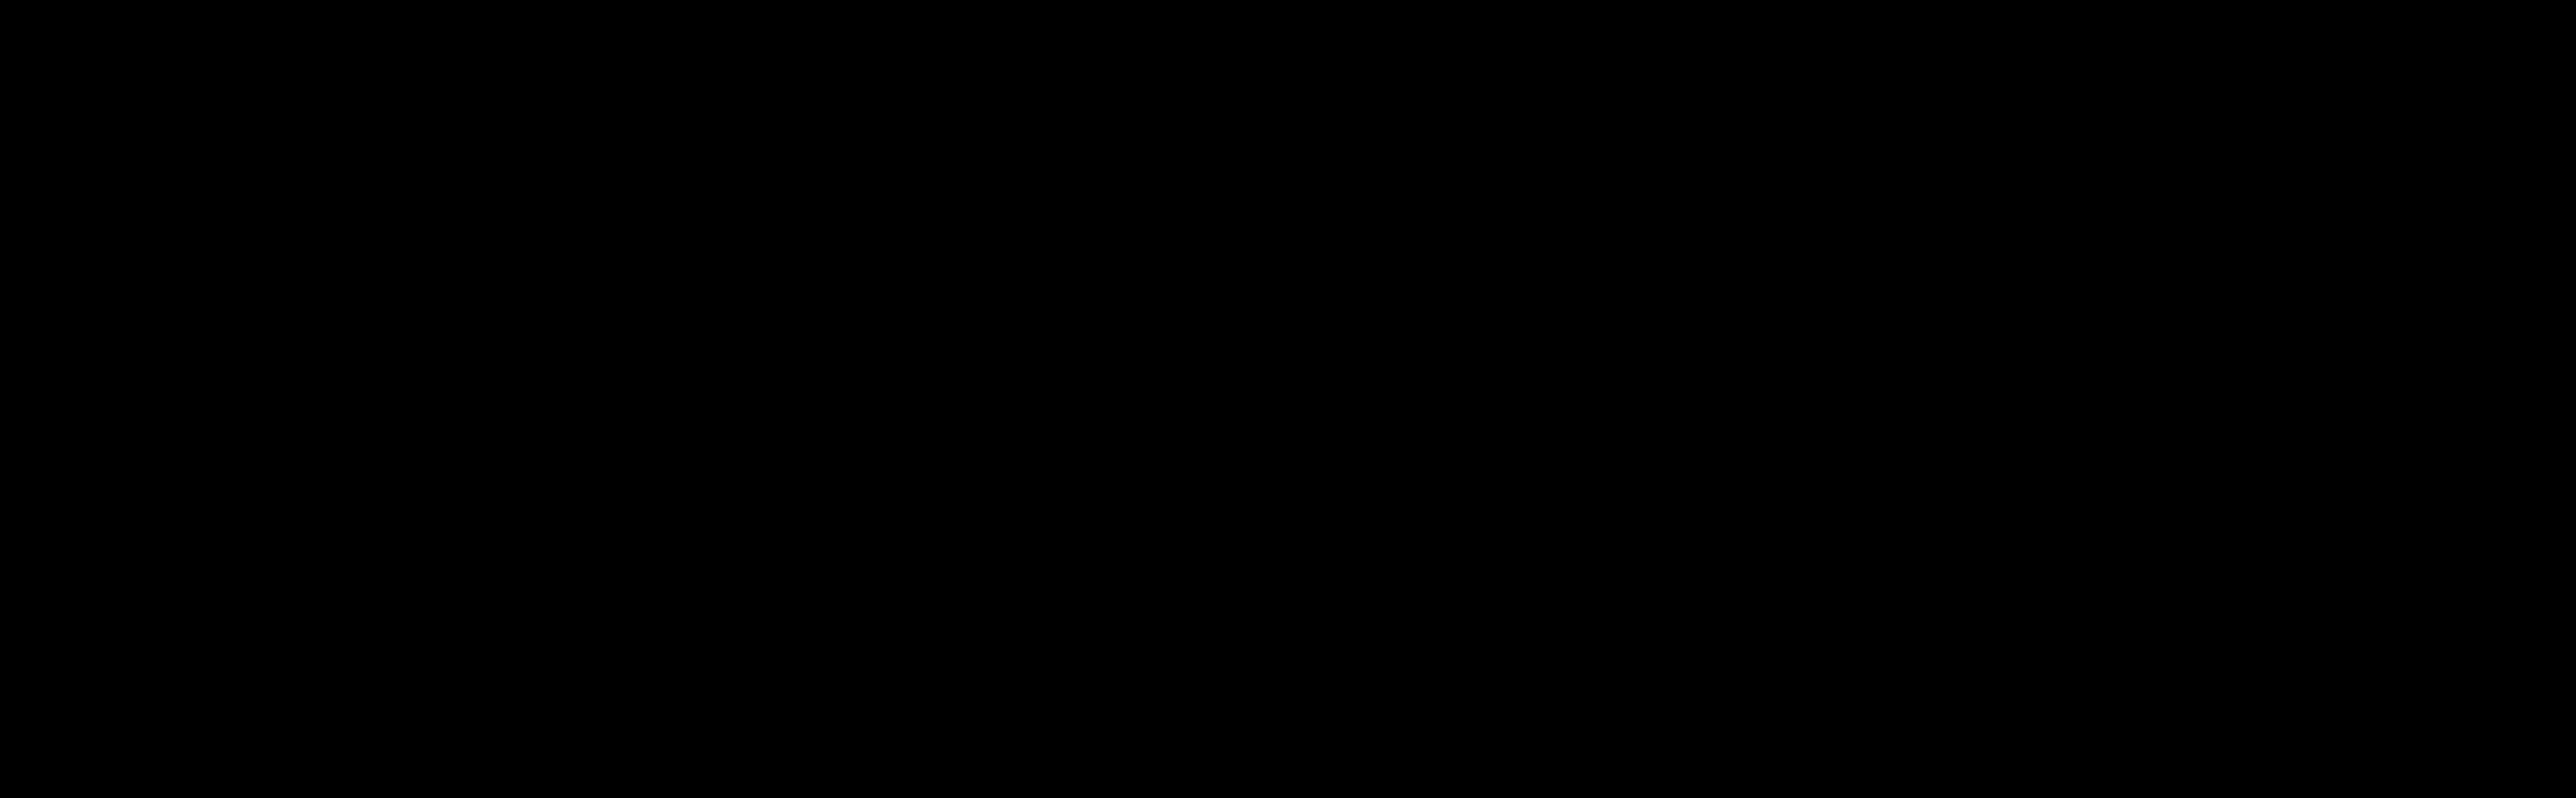 Daclatasvir-d<sub>16</sub> dihydrochloride